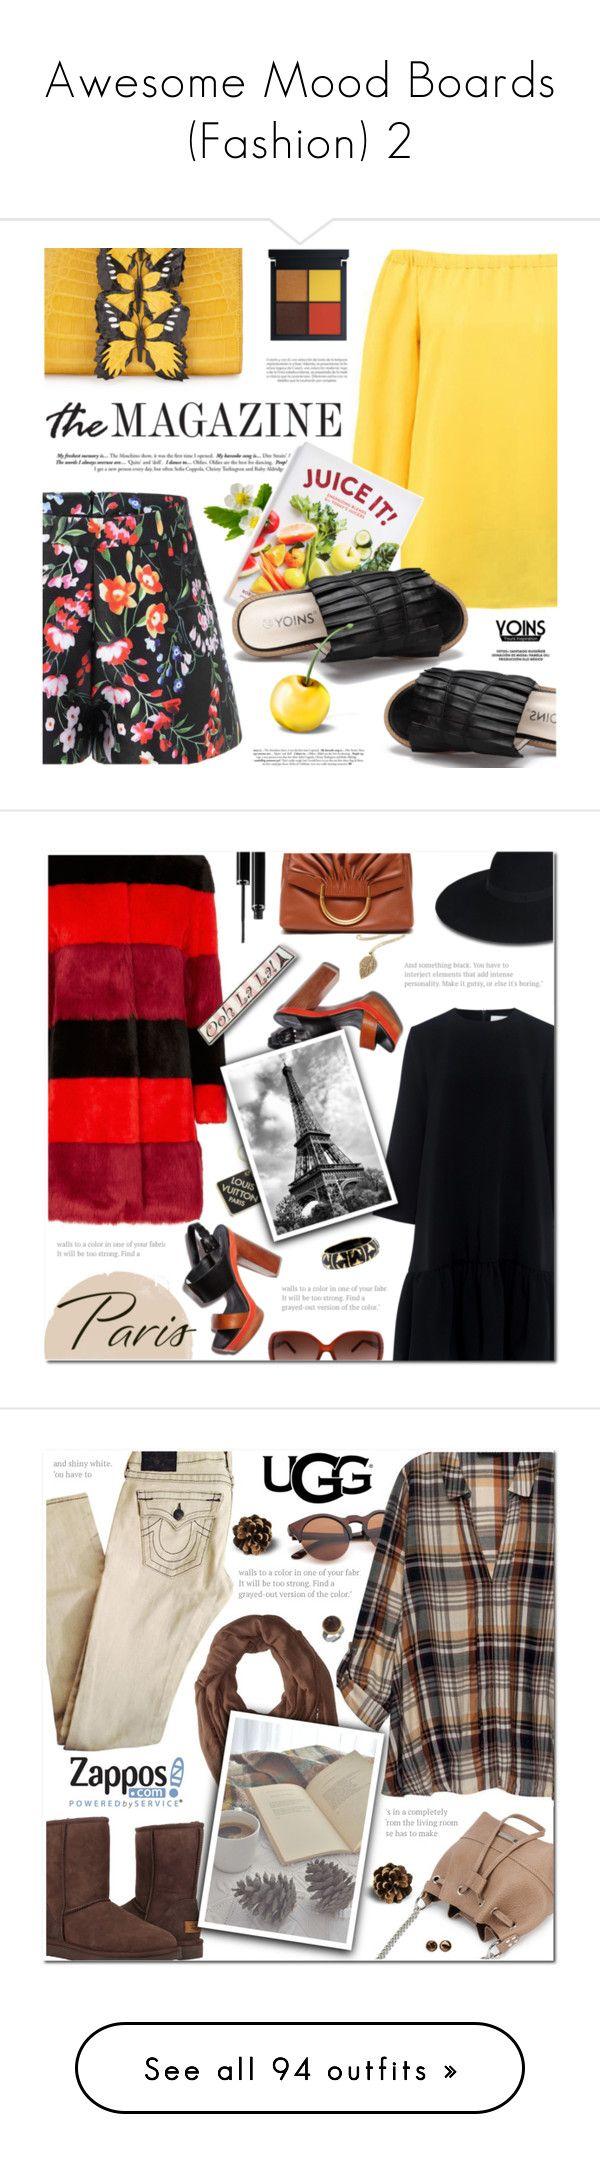 """Awesome Mood Boards (Fashion) 2"" by queenrachietemplateaddict ❤ liked on Polyvore featuring Chronicle Books, Nancy Gonzalez, AINEA, Edit, Maison Michel, Louis Vuitton, Angélique de Paris, STELLA McCARTNEY, Sisley and Chloé"